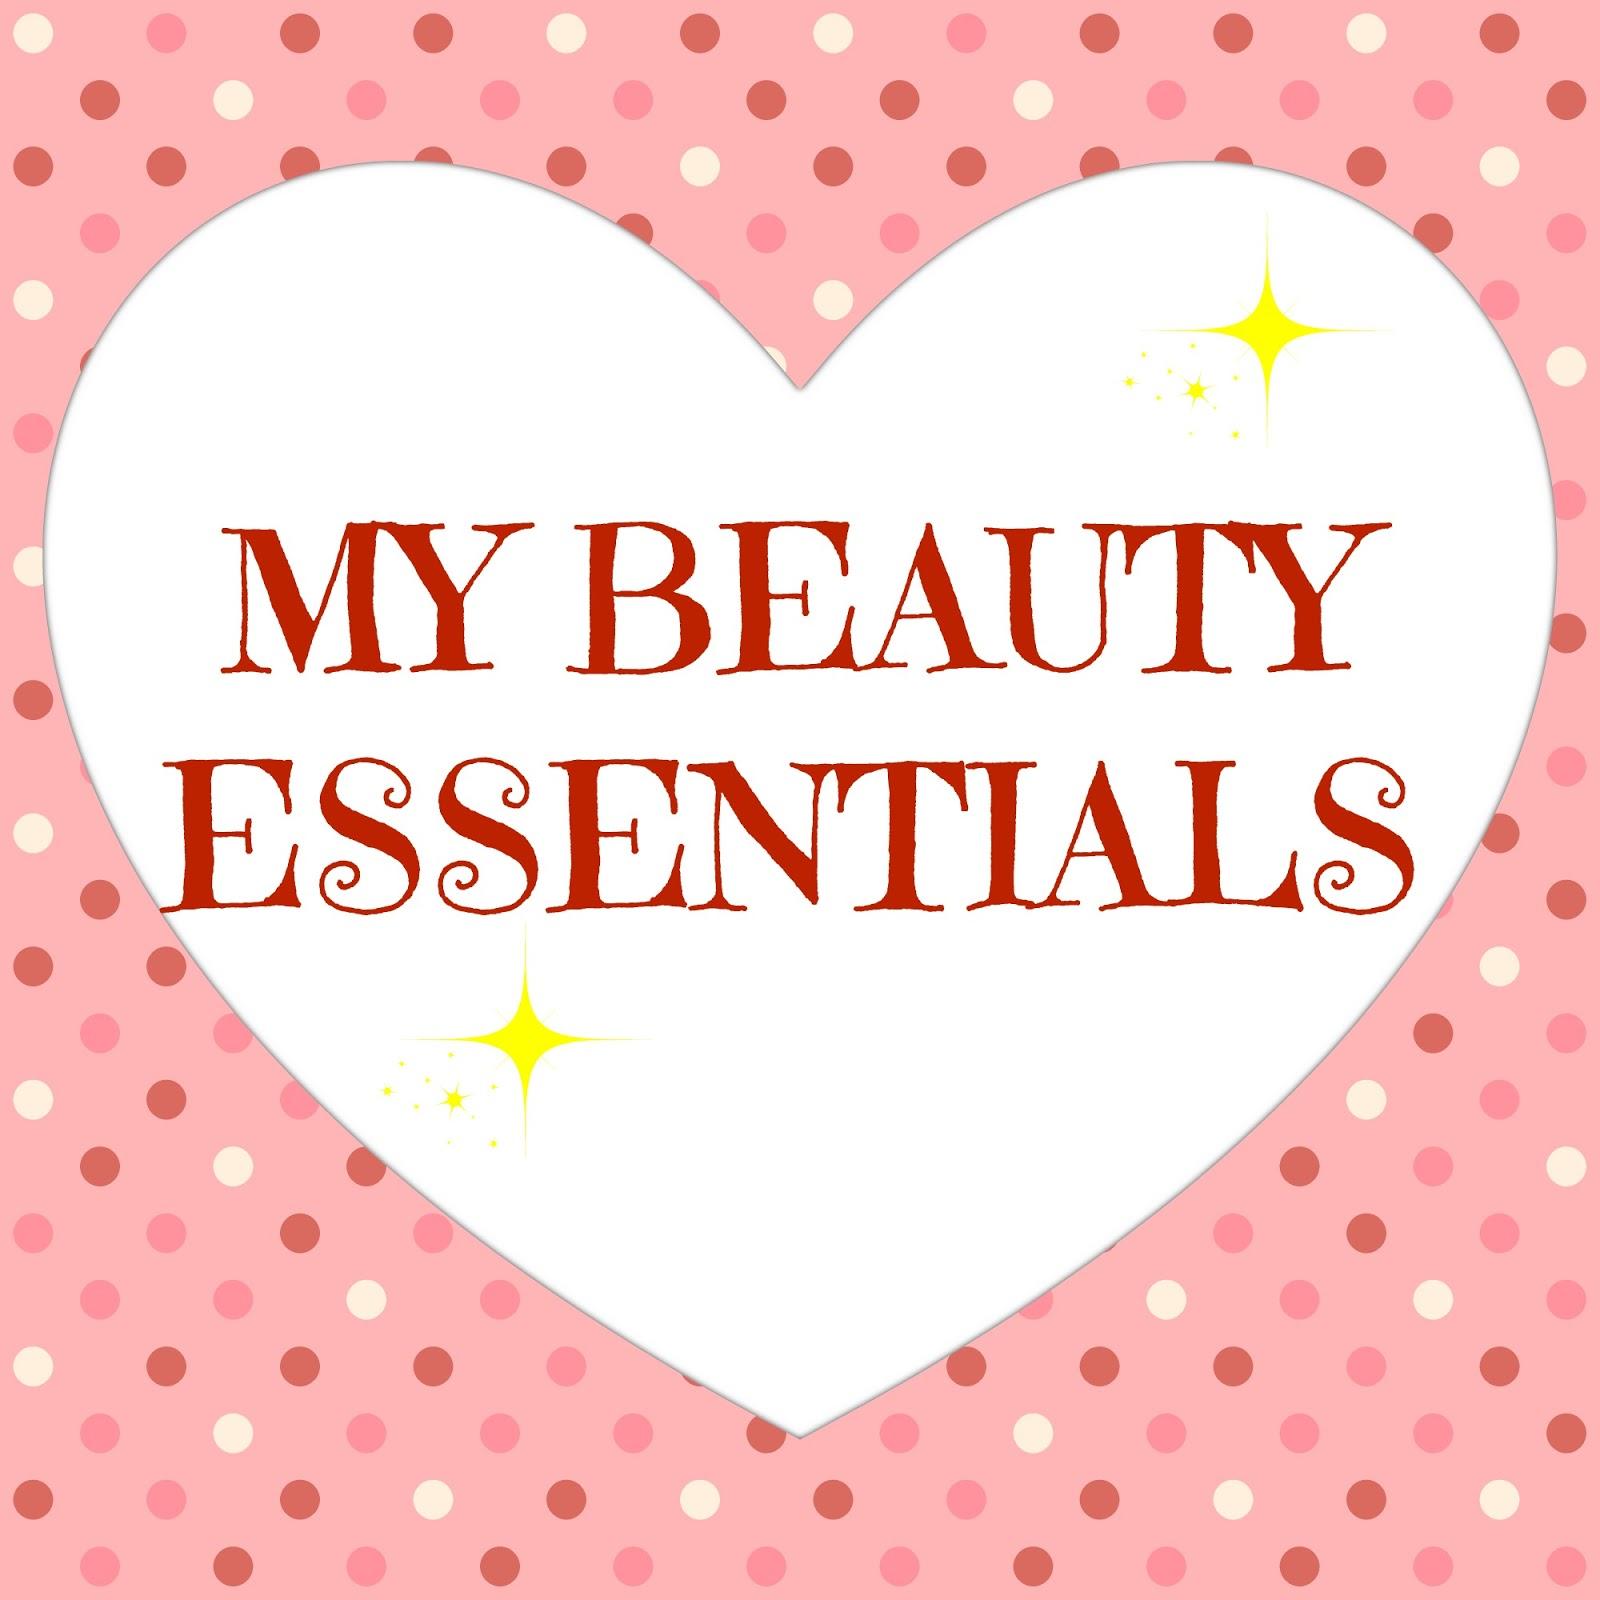 My Beauty Essentials - Beauty Talk With Lauren